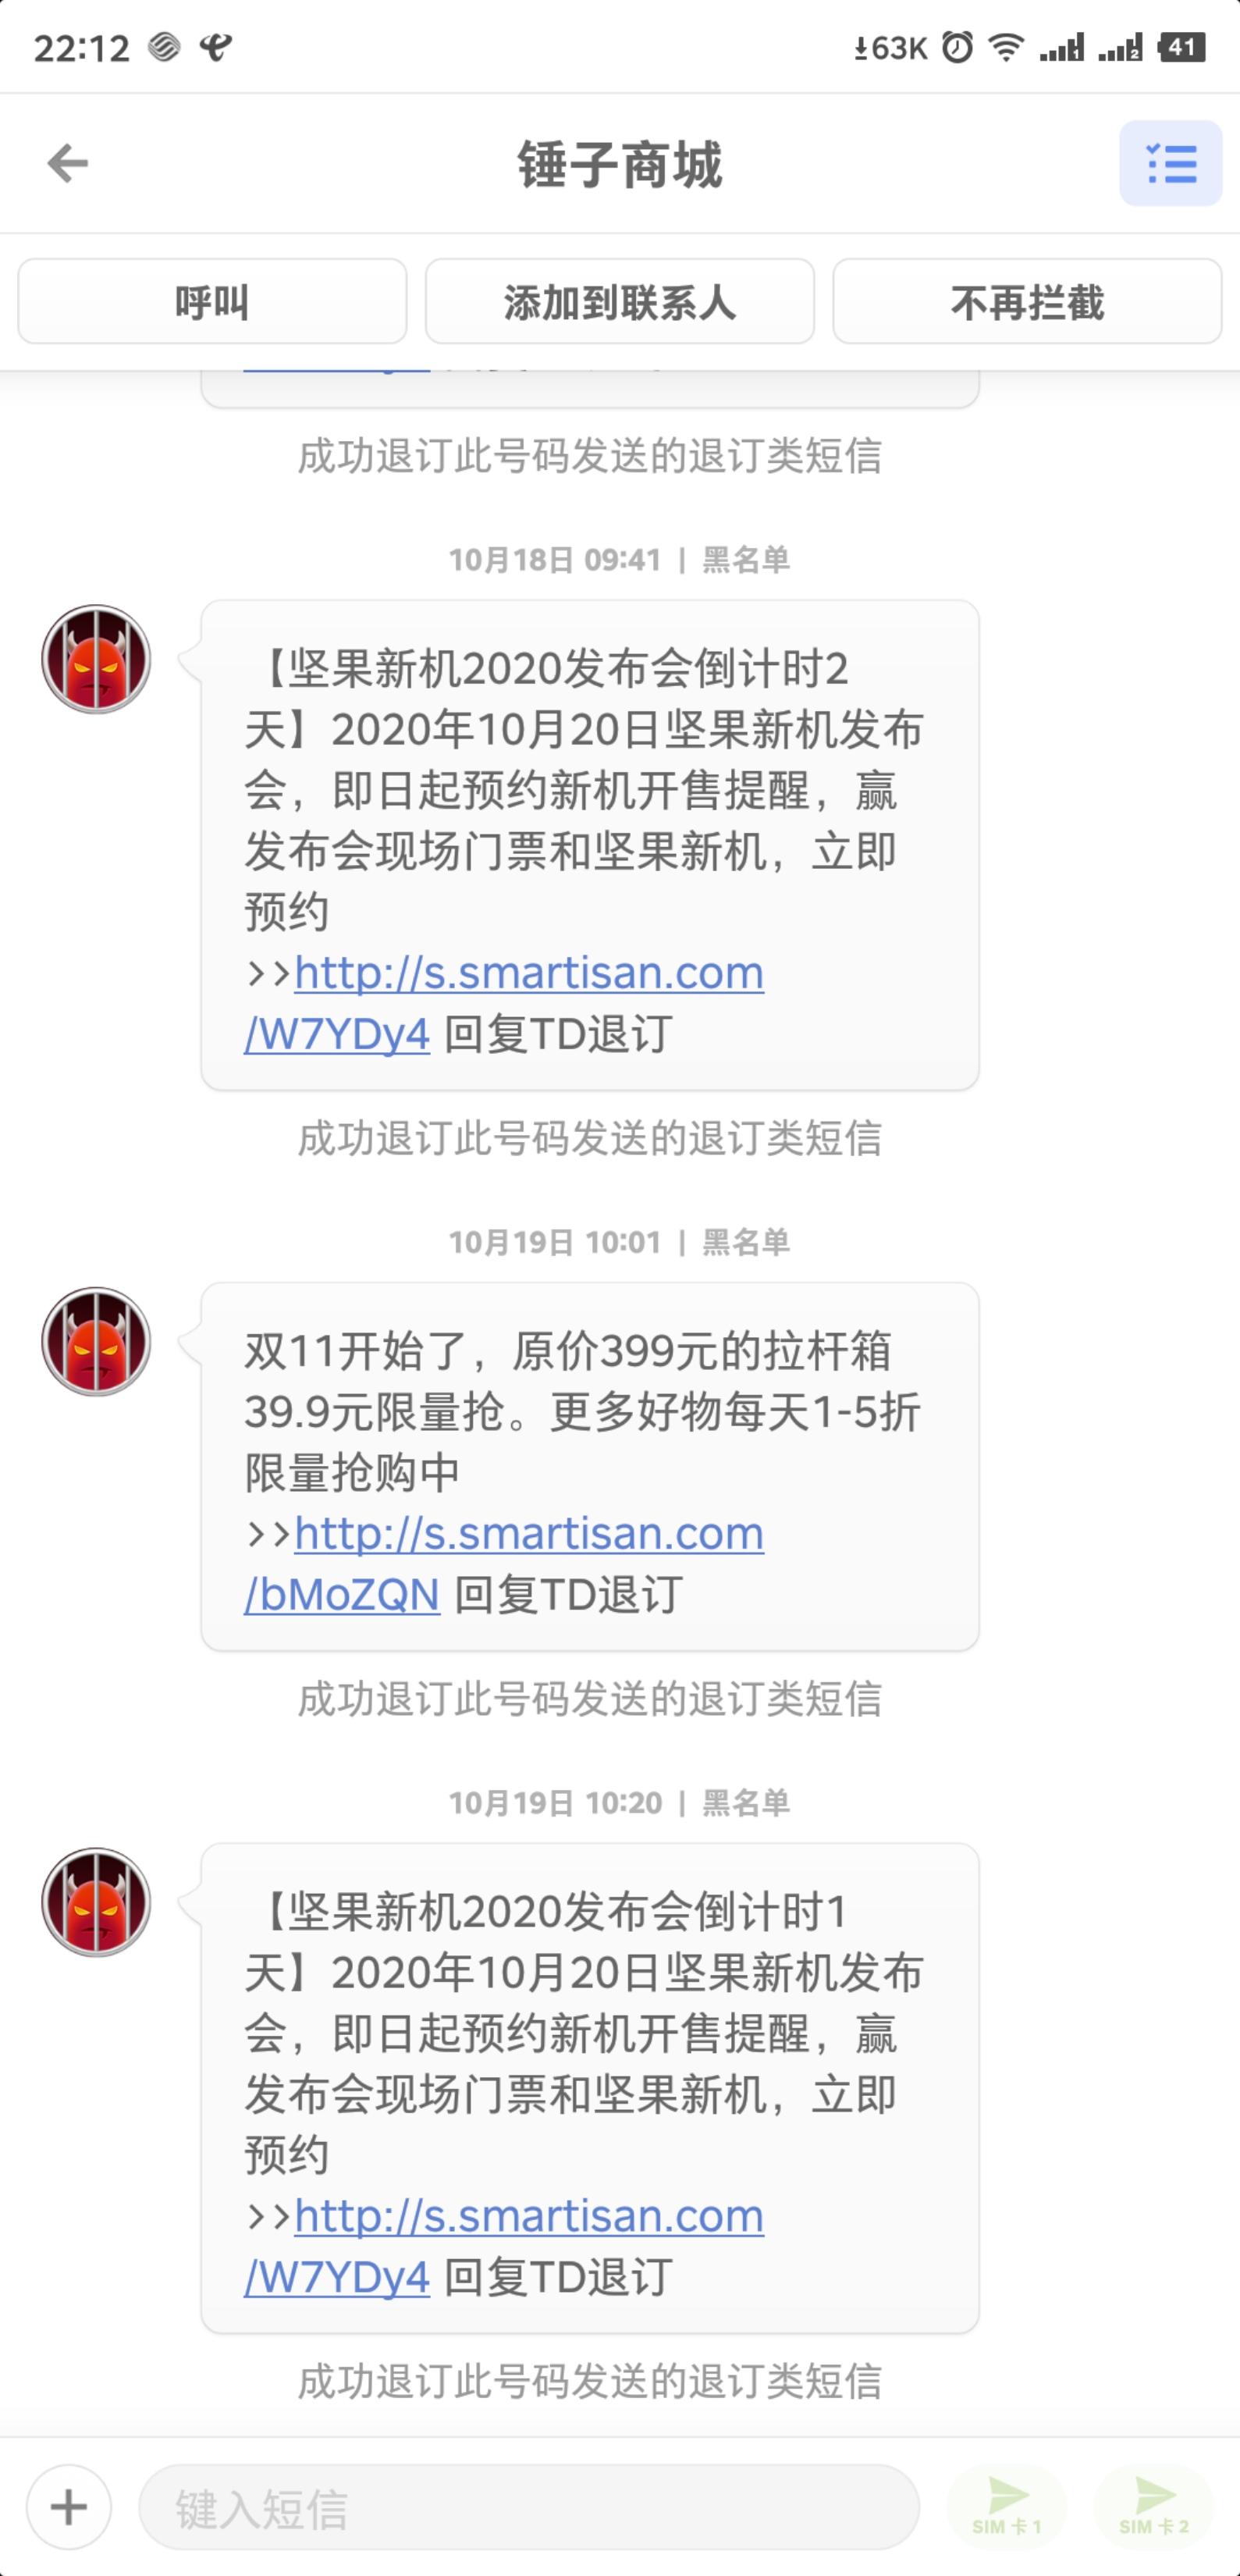 Screenshot_2020-10-19-22-12-55-323_??.png